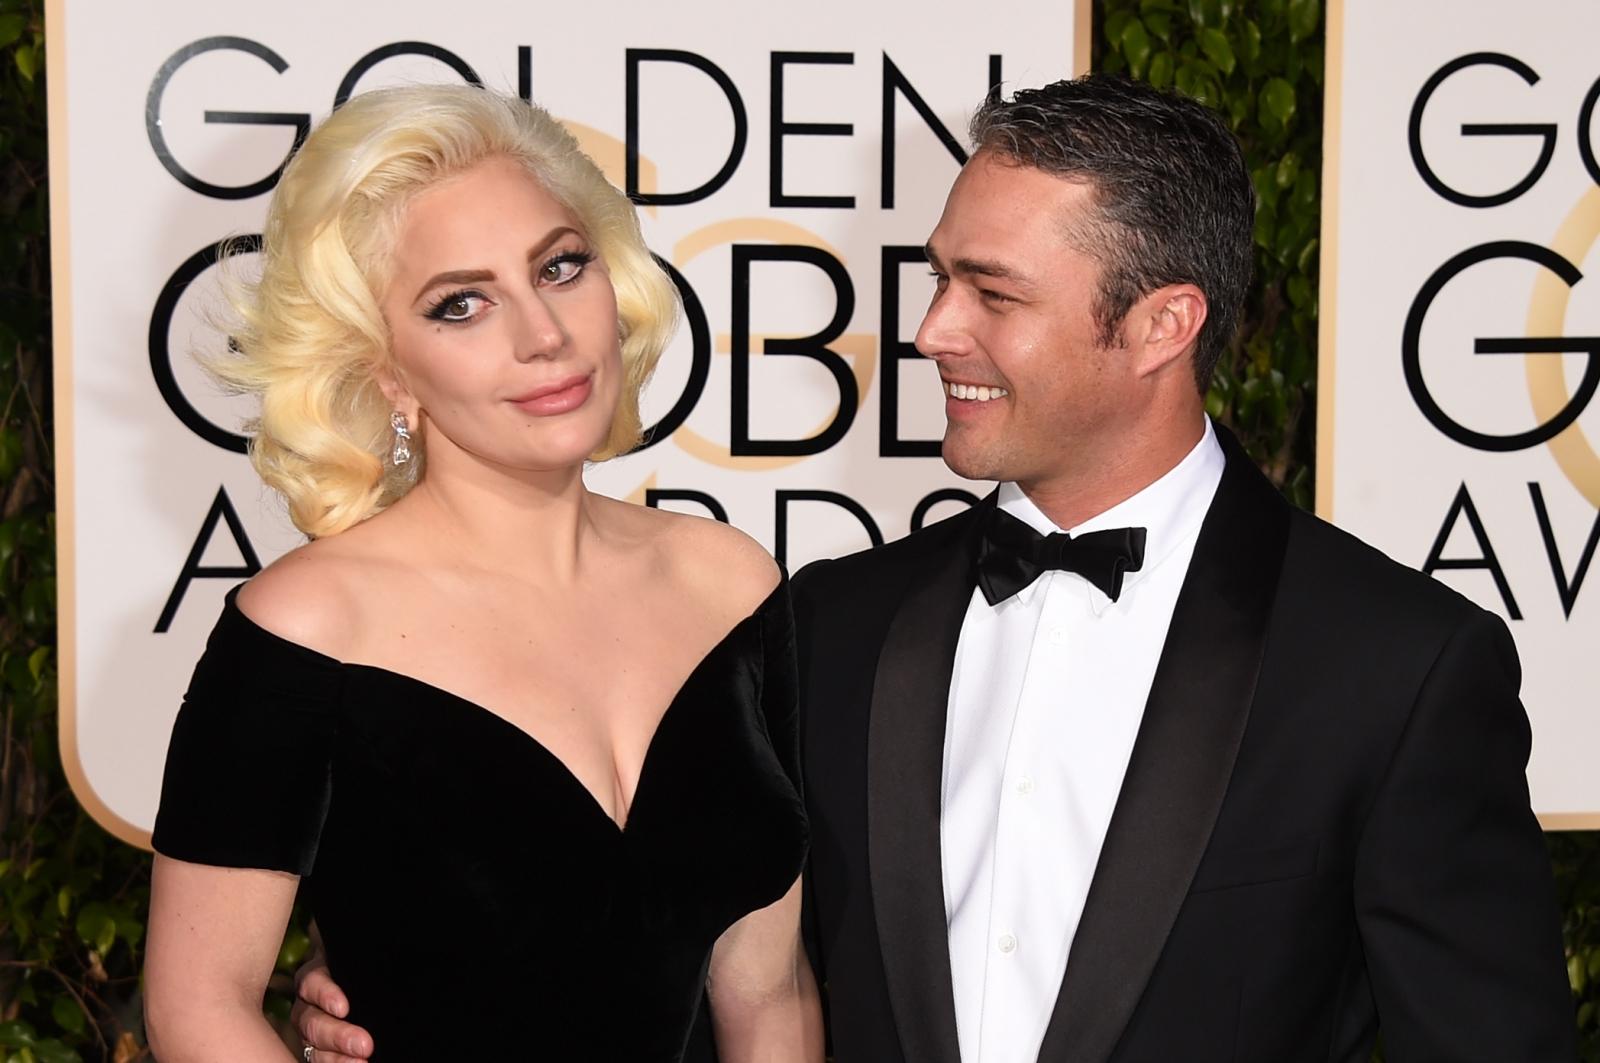 Lady Gaga and Taylor Kinney